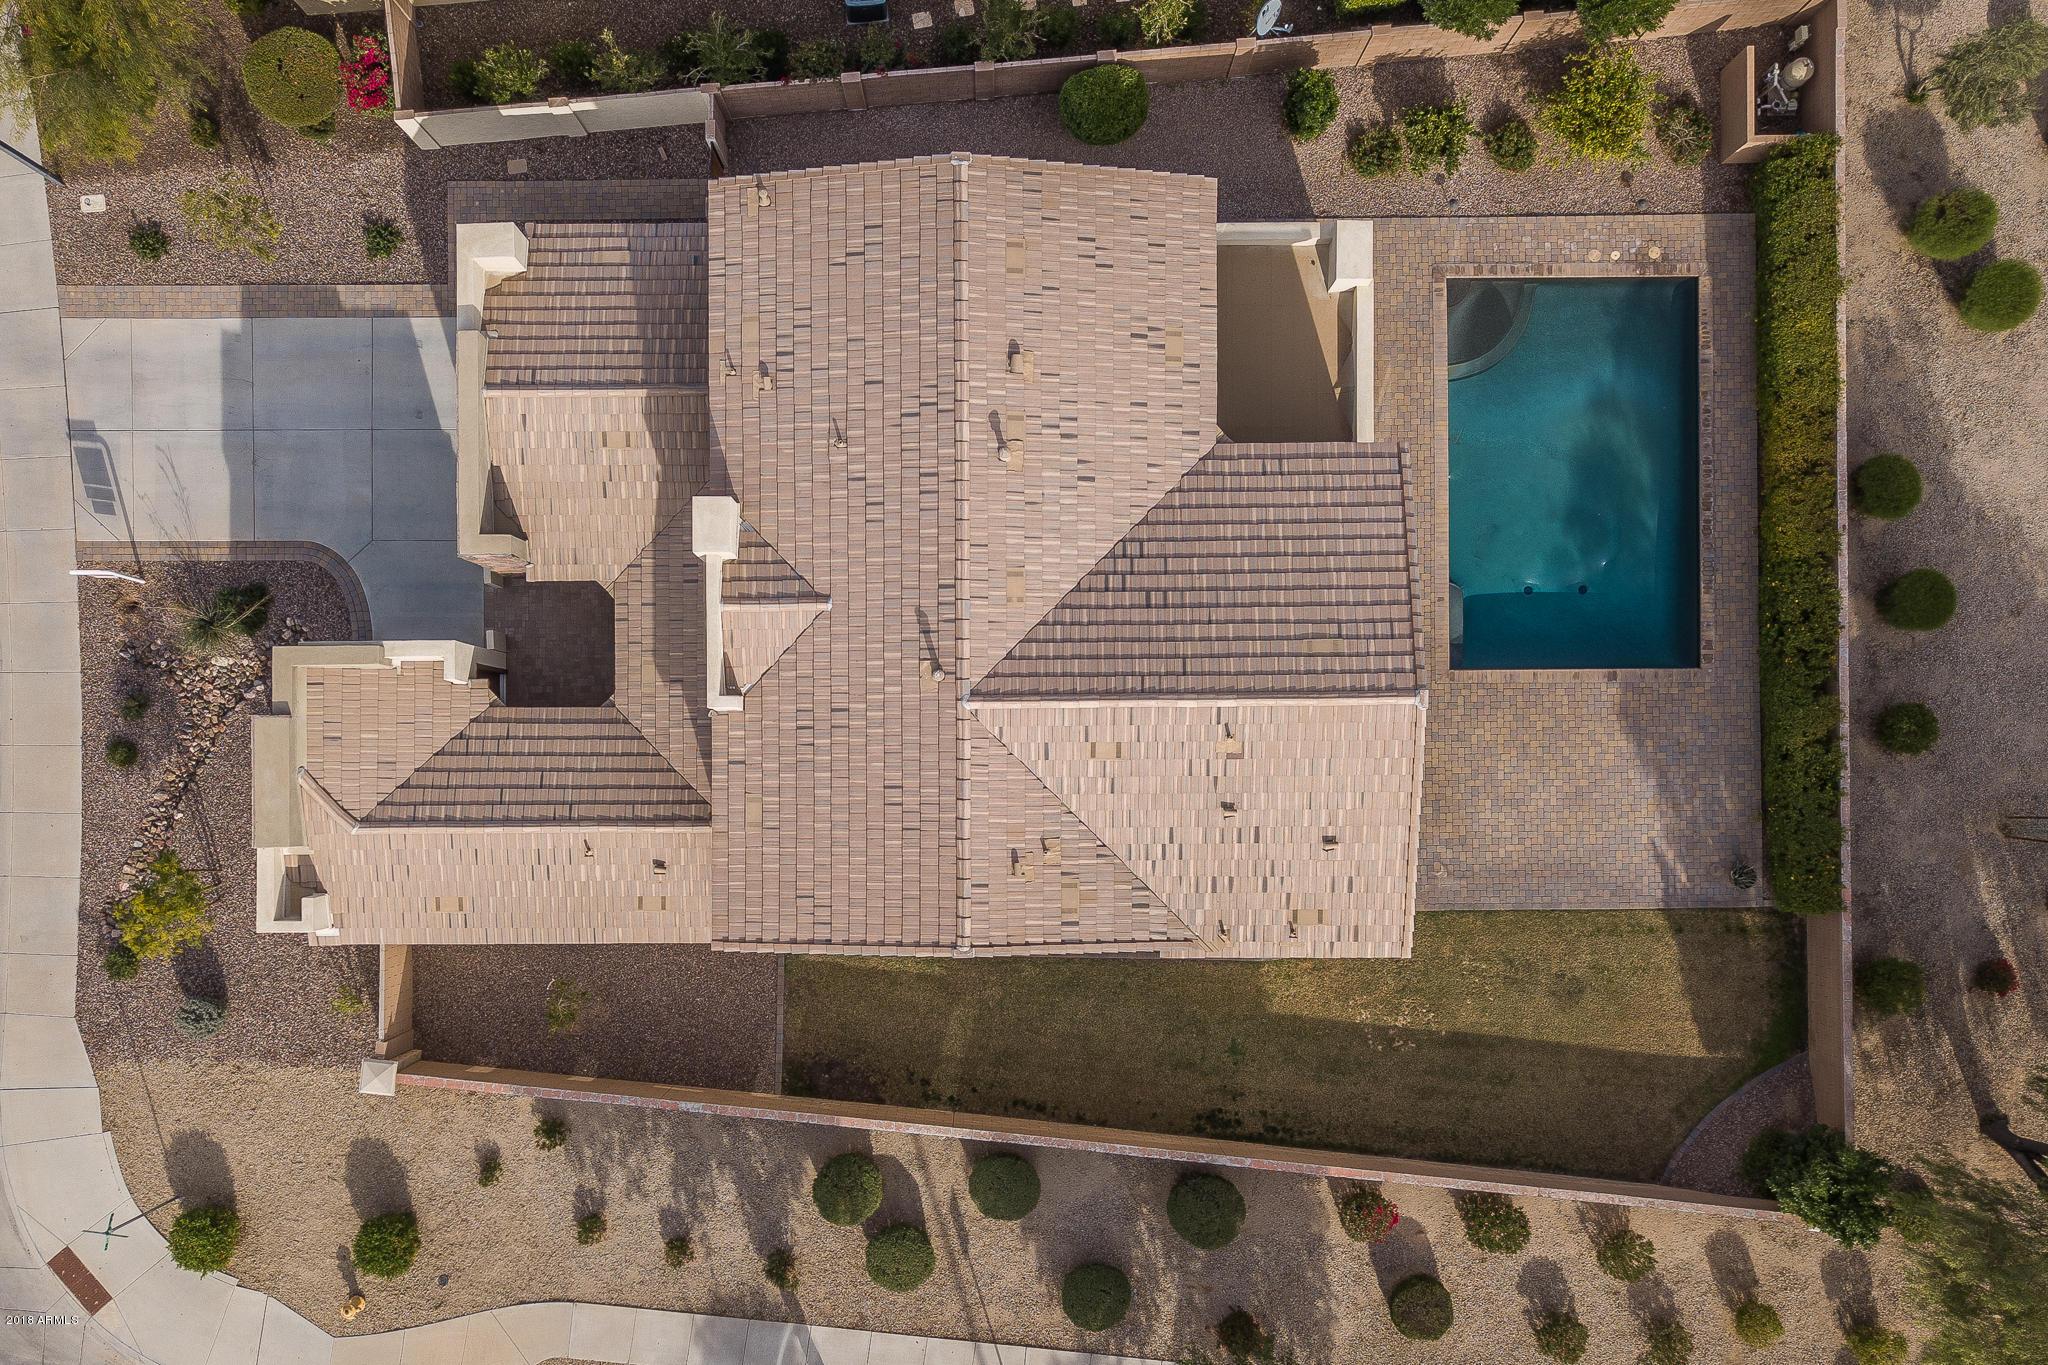 MLS 5851018 3335 E TONTO Drive, Gilbert, AZ 85298 Gilbert AZ Marbella Vineyards